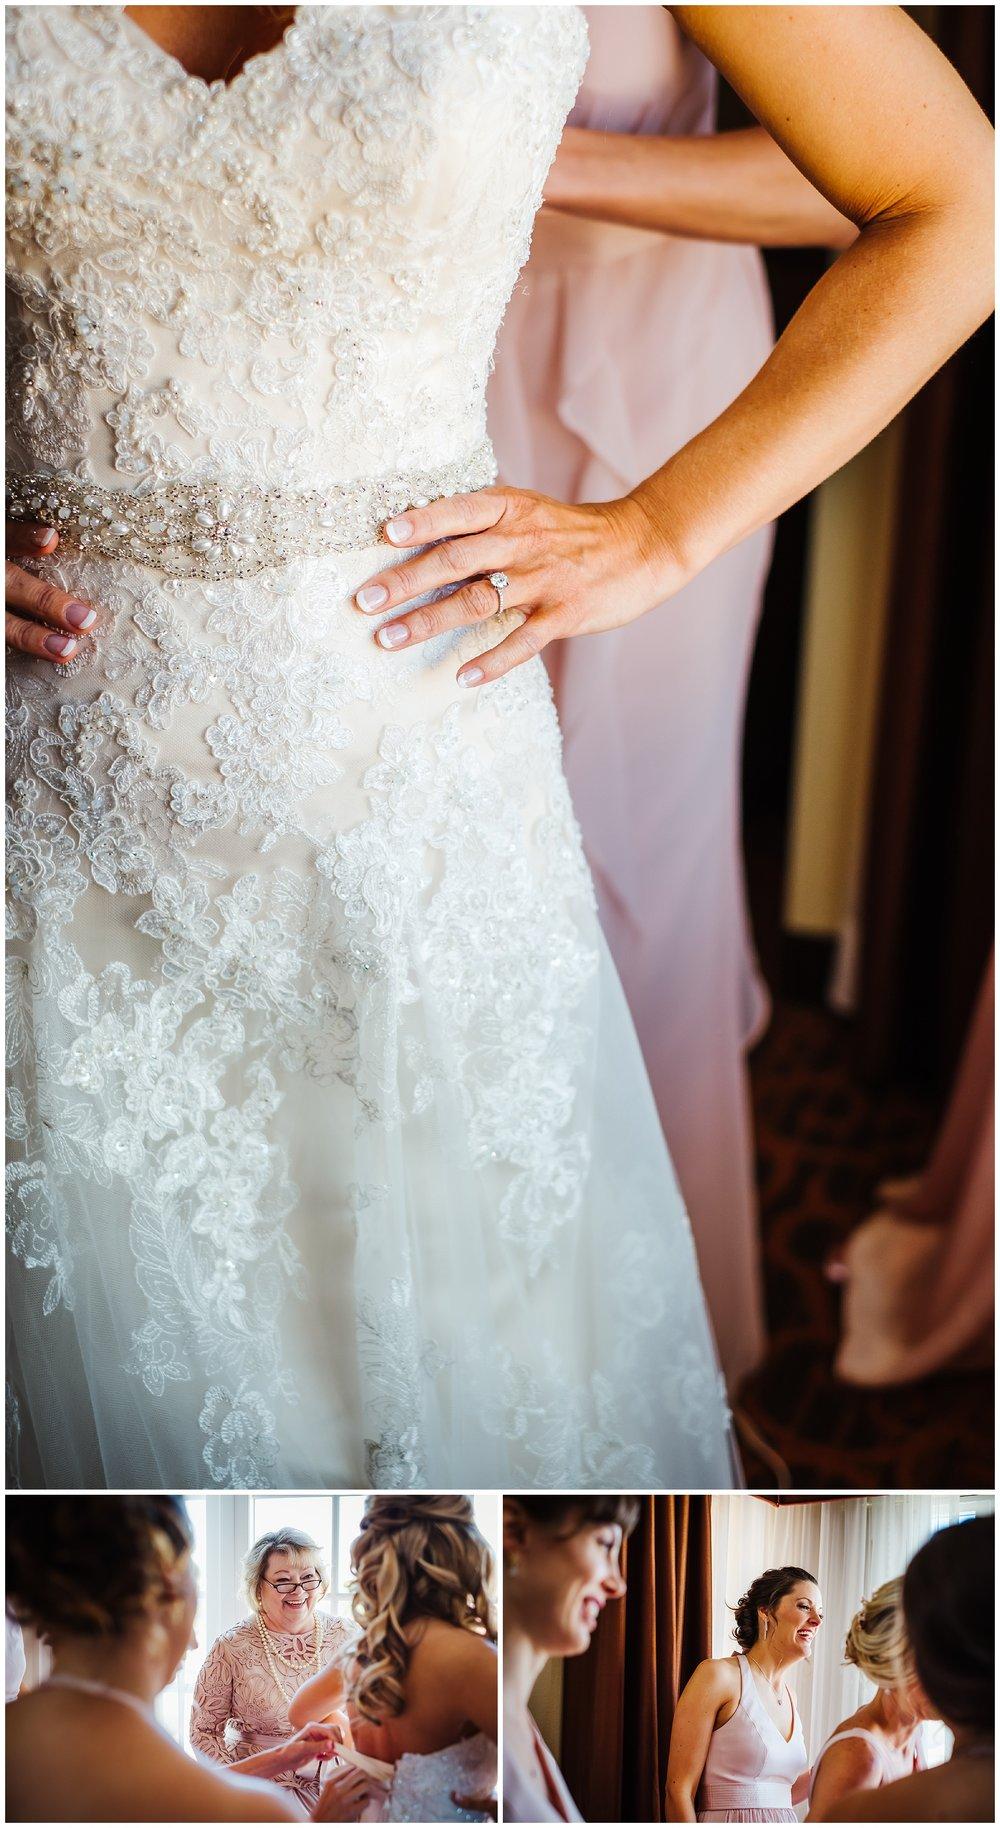 tampa-bradenton-wedding-photographer-south-florida-museum-classic-blush-gold-alpacas-sparklers_0008.jpg